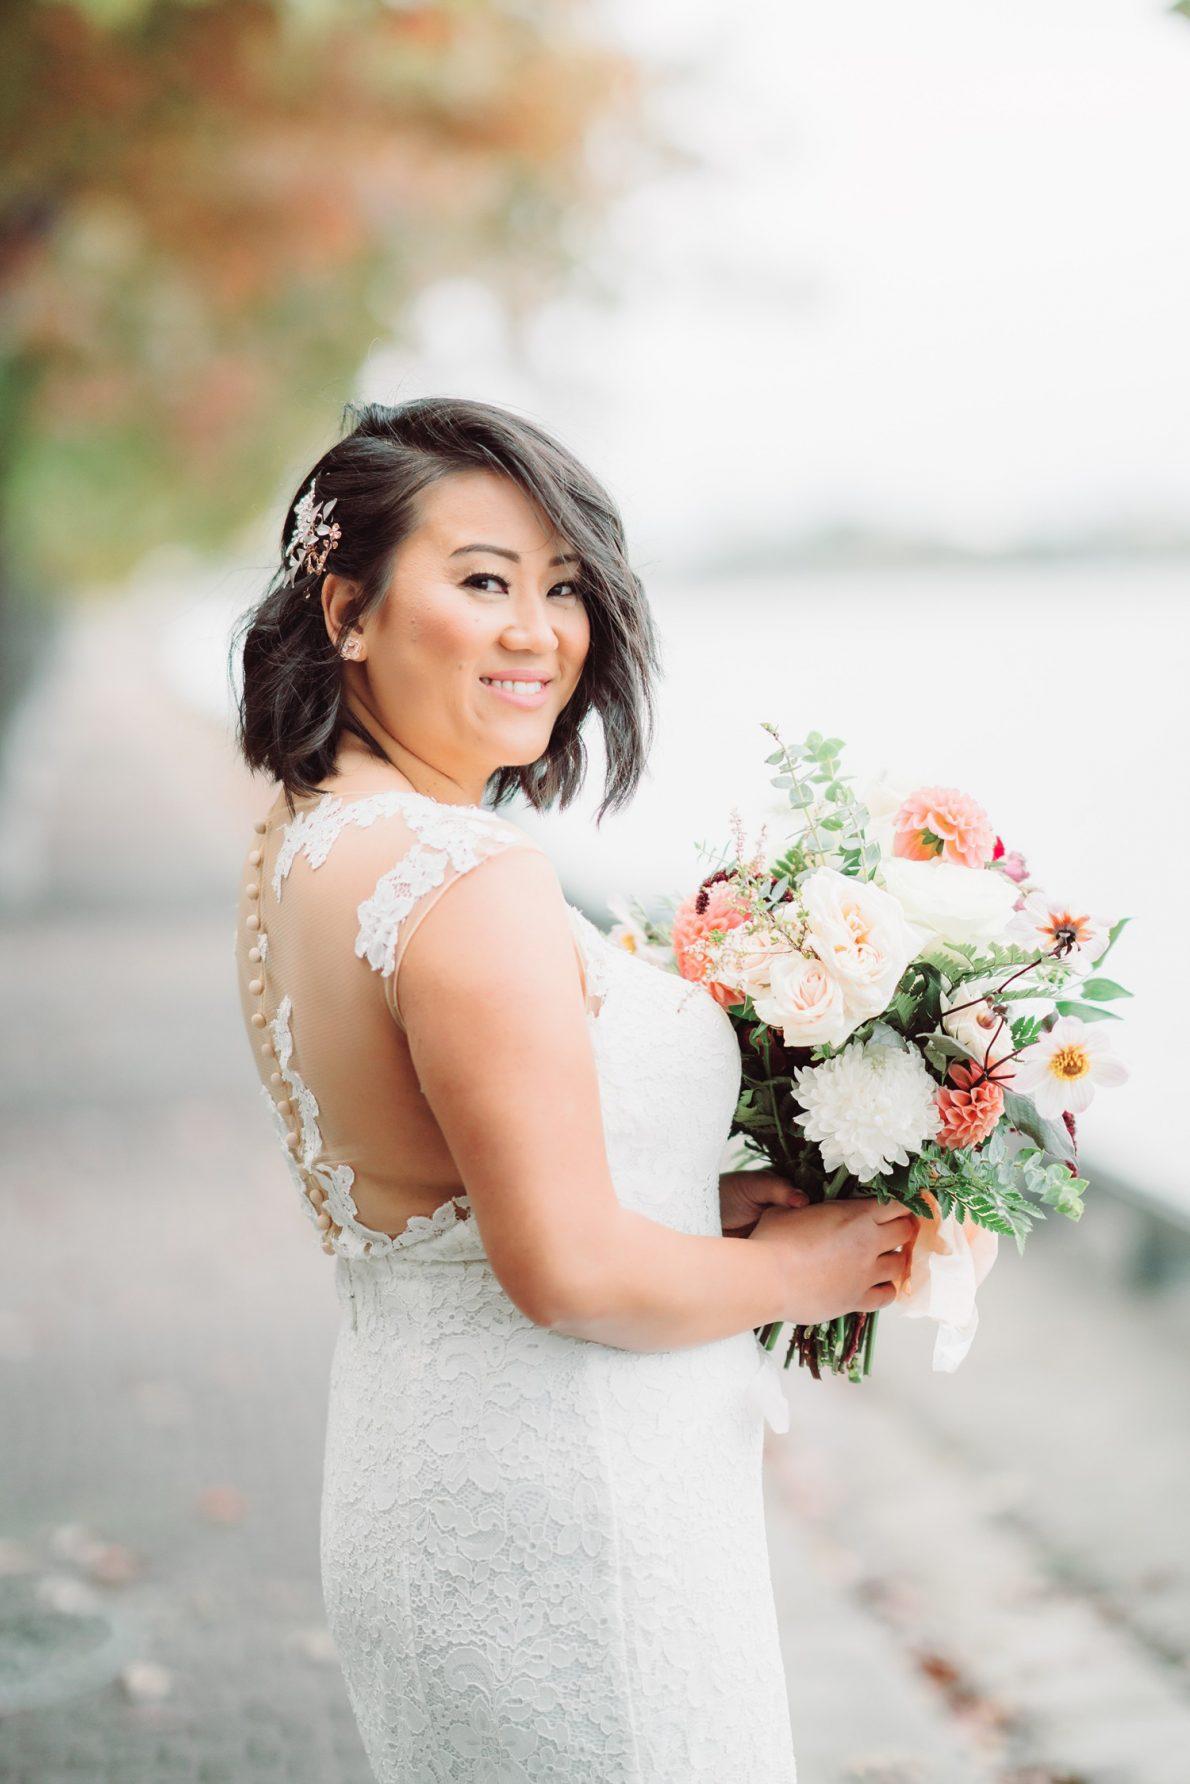 Happy_Bride_Distillery_District_Thompson_Landry_Gallery_Toronto_Wedding_Photos-Rhythm_Photography